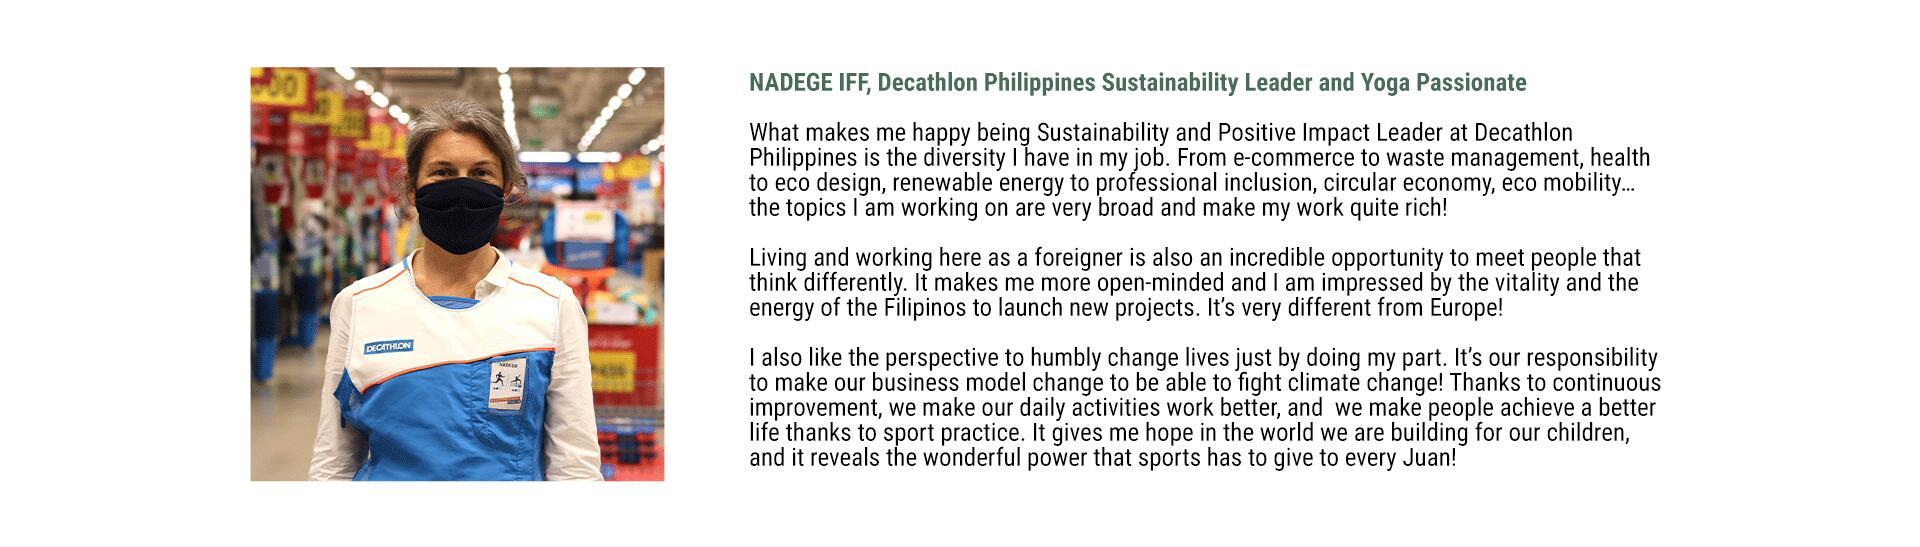 Decathlon Philippines Sustainability - Nadege Iff